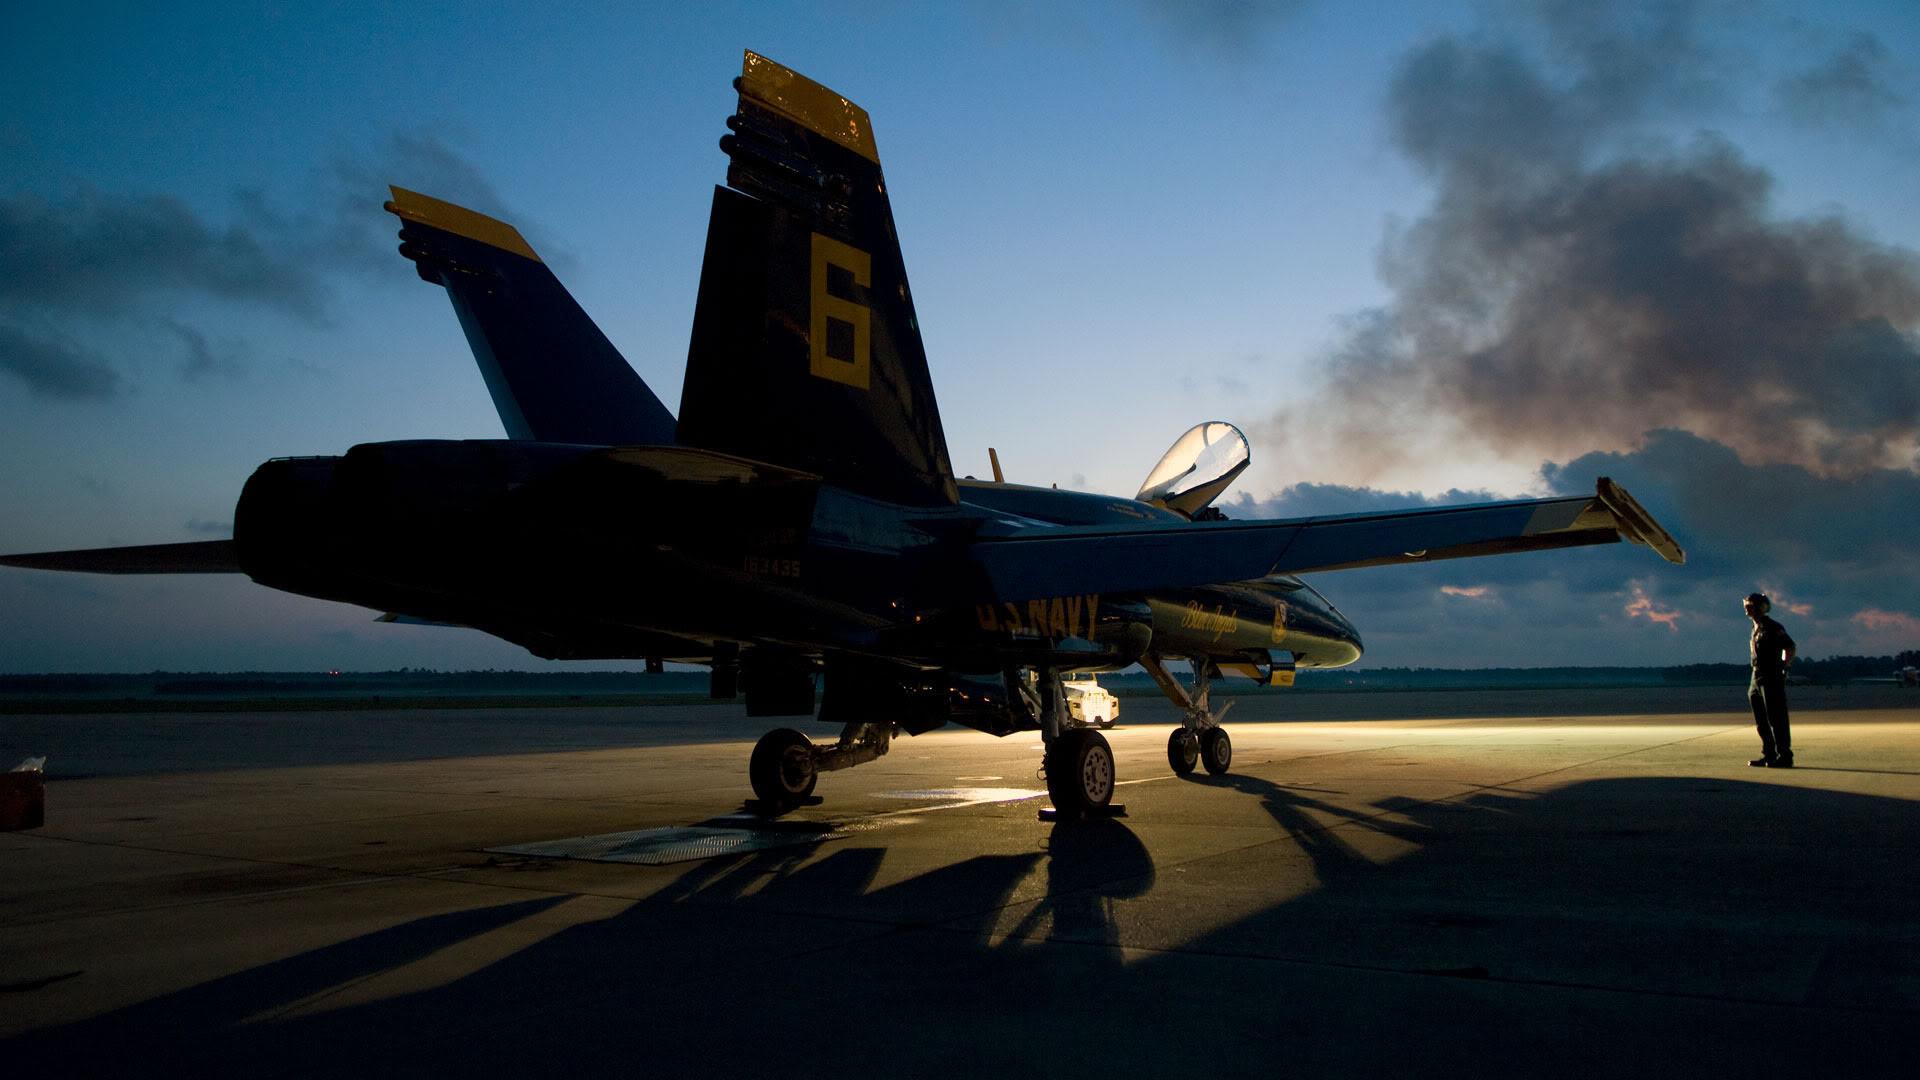 Aircraft Air Superiority Blue Angels F18 F 18 F 18E Super Hornet F 18 1920x1080